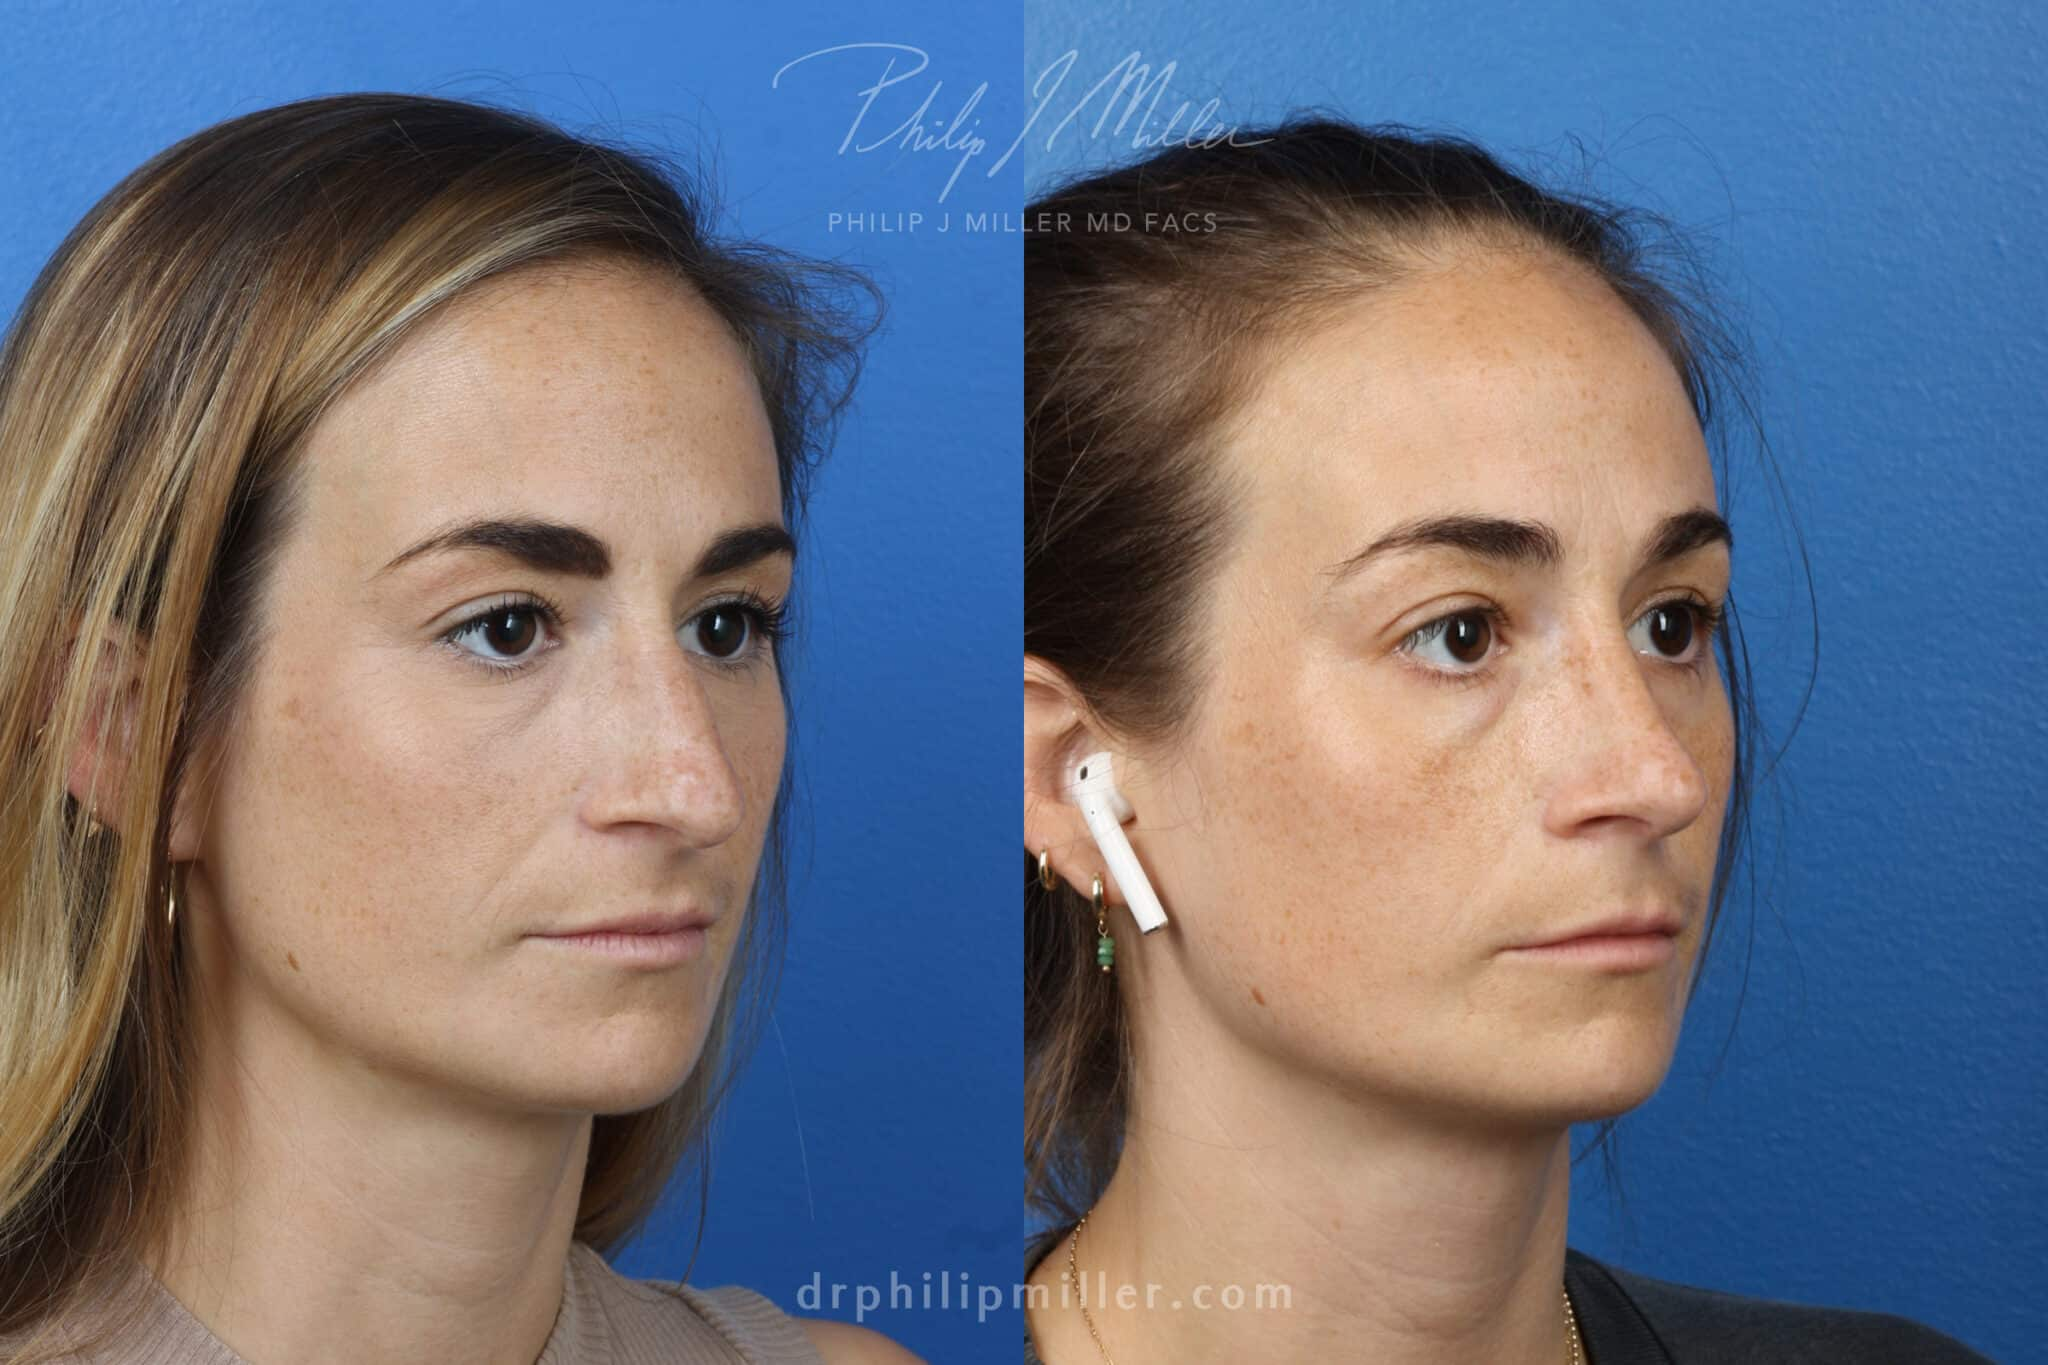 Rhinoplasty-to-correct-nasal-bridge-female-Miller